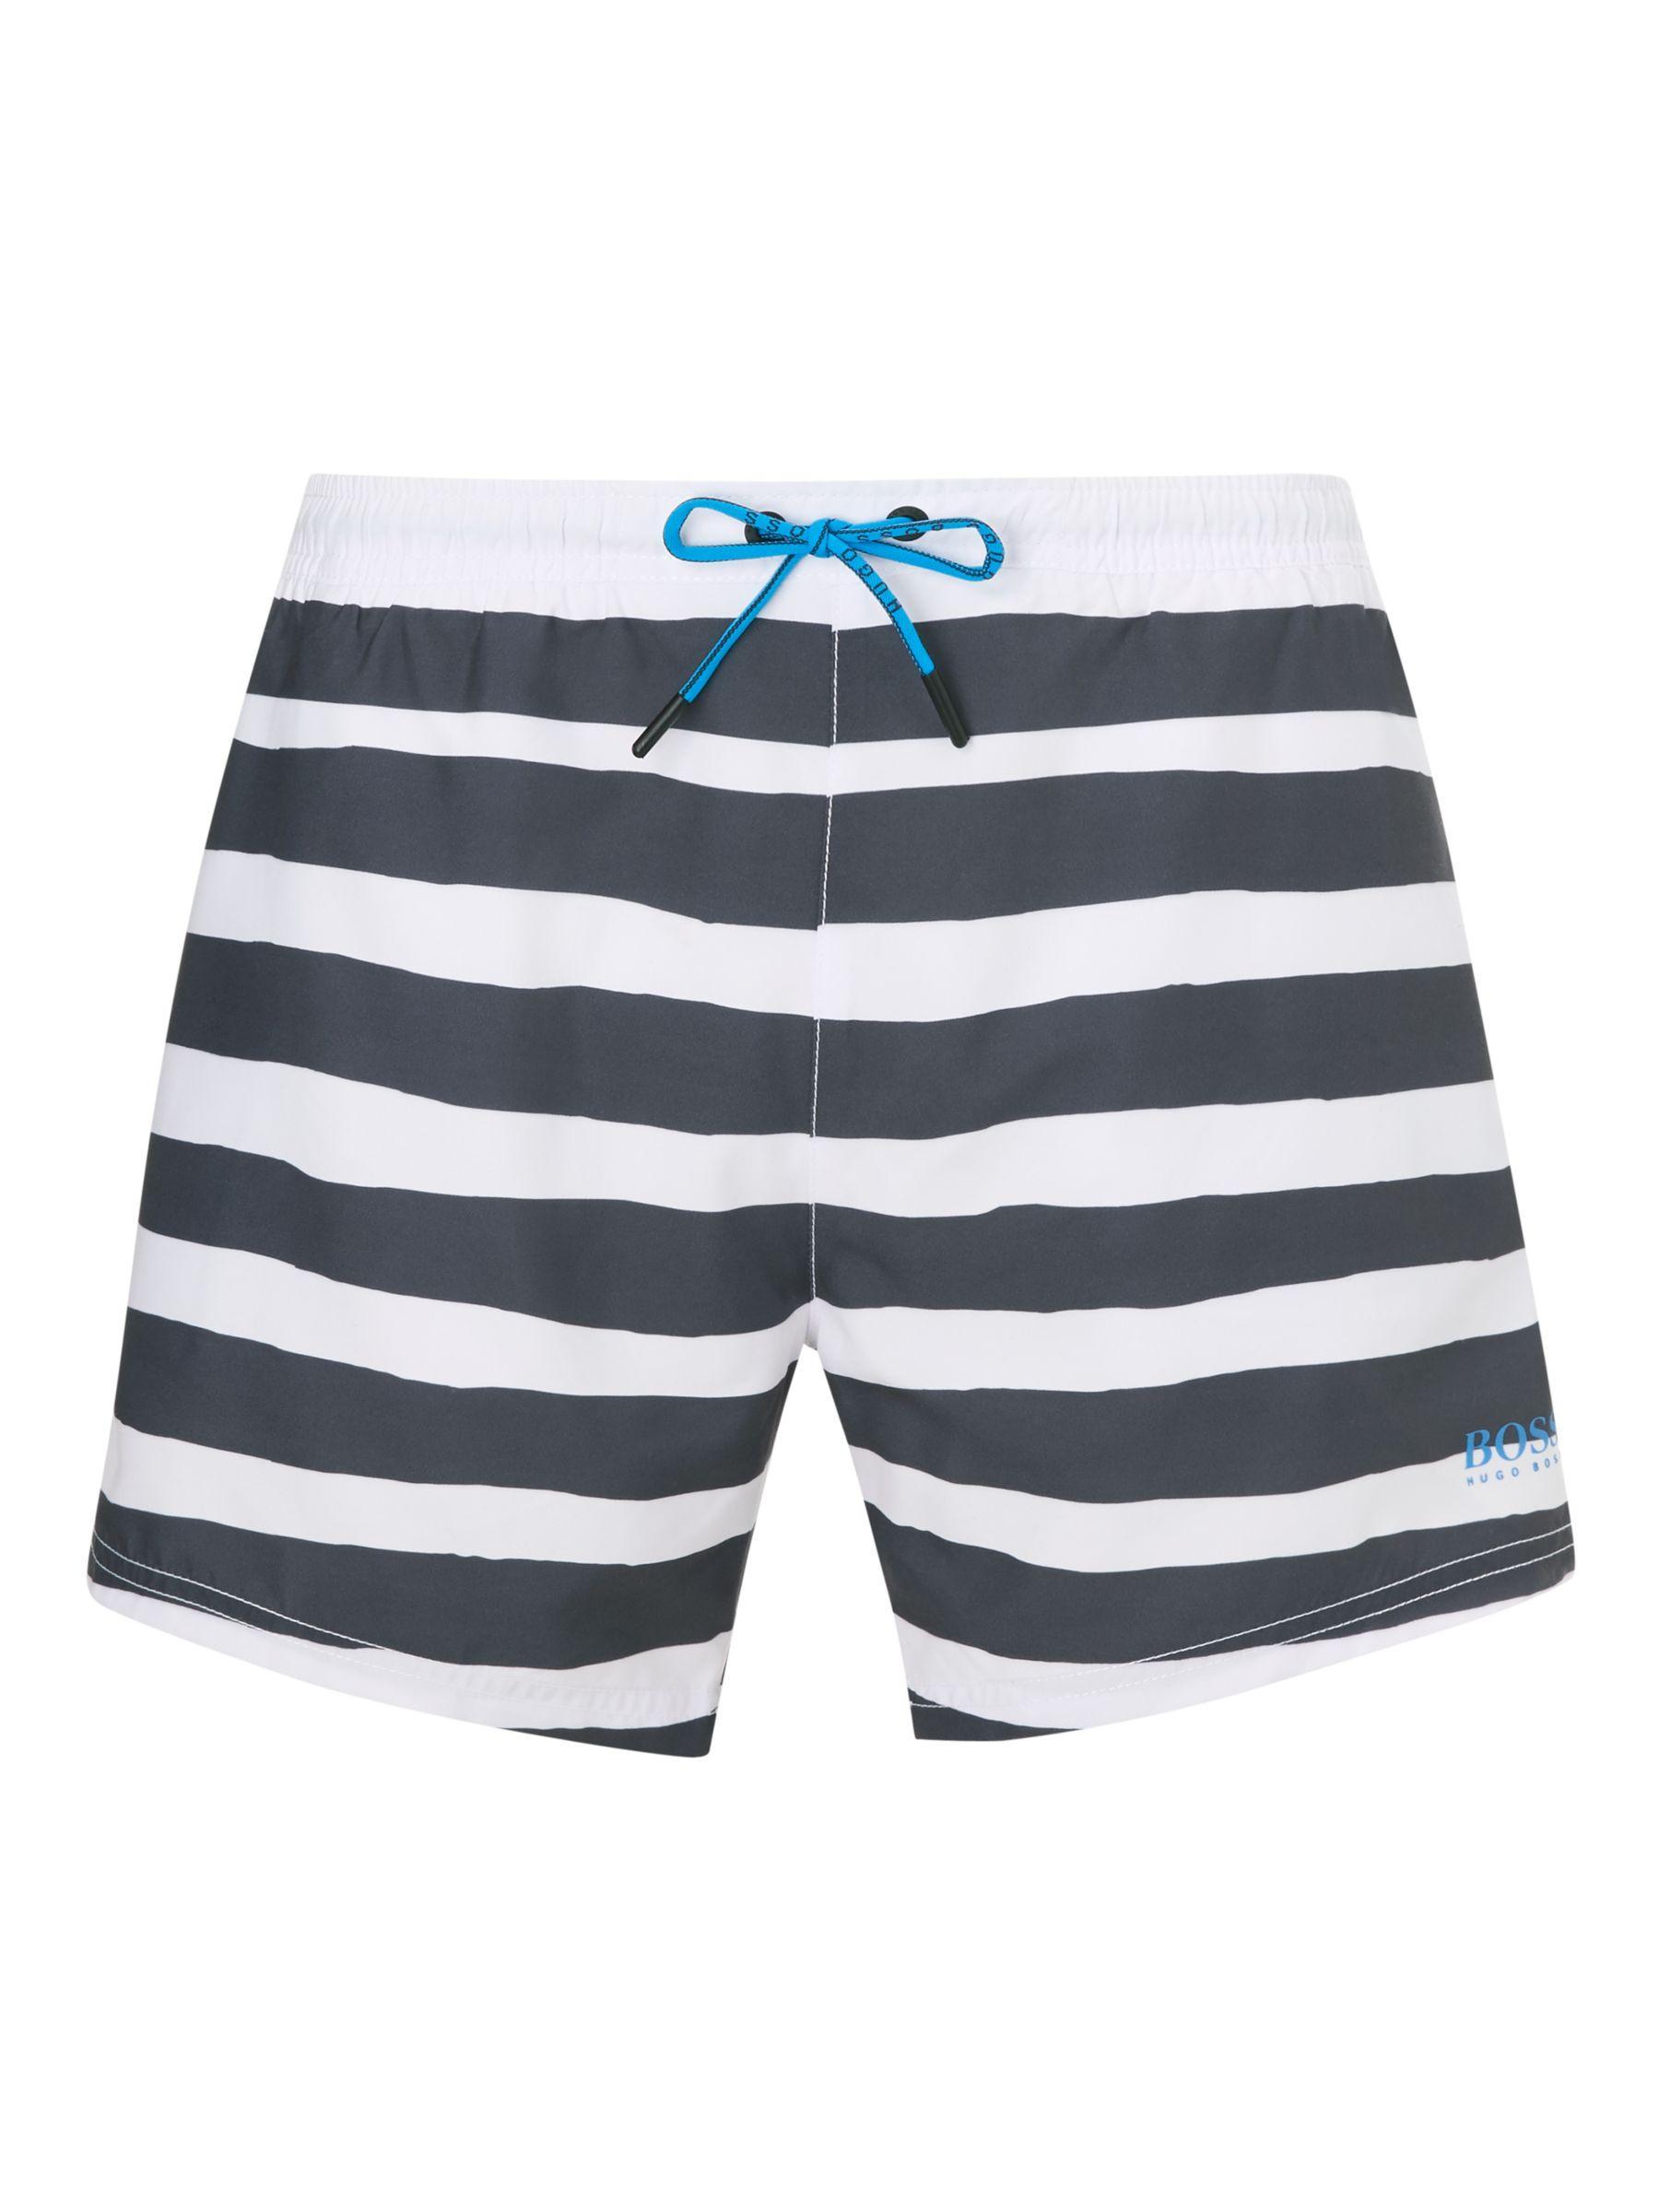 9cd05ae667 BOSS Scorpion Swim Shorts in Blue for Men - Lyst